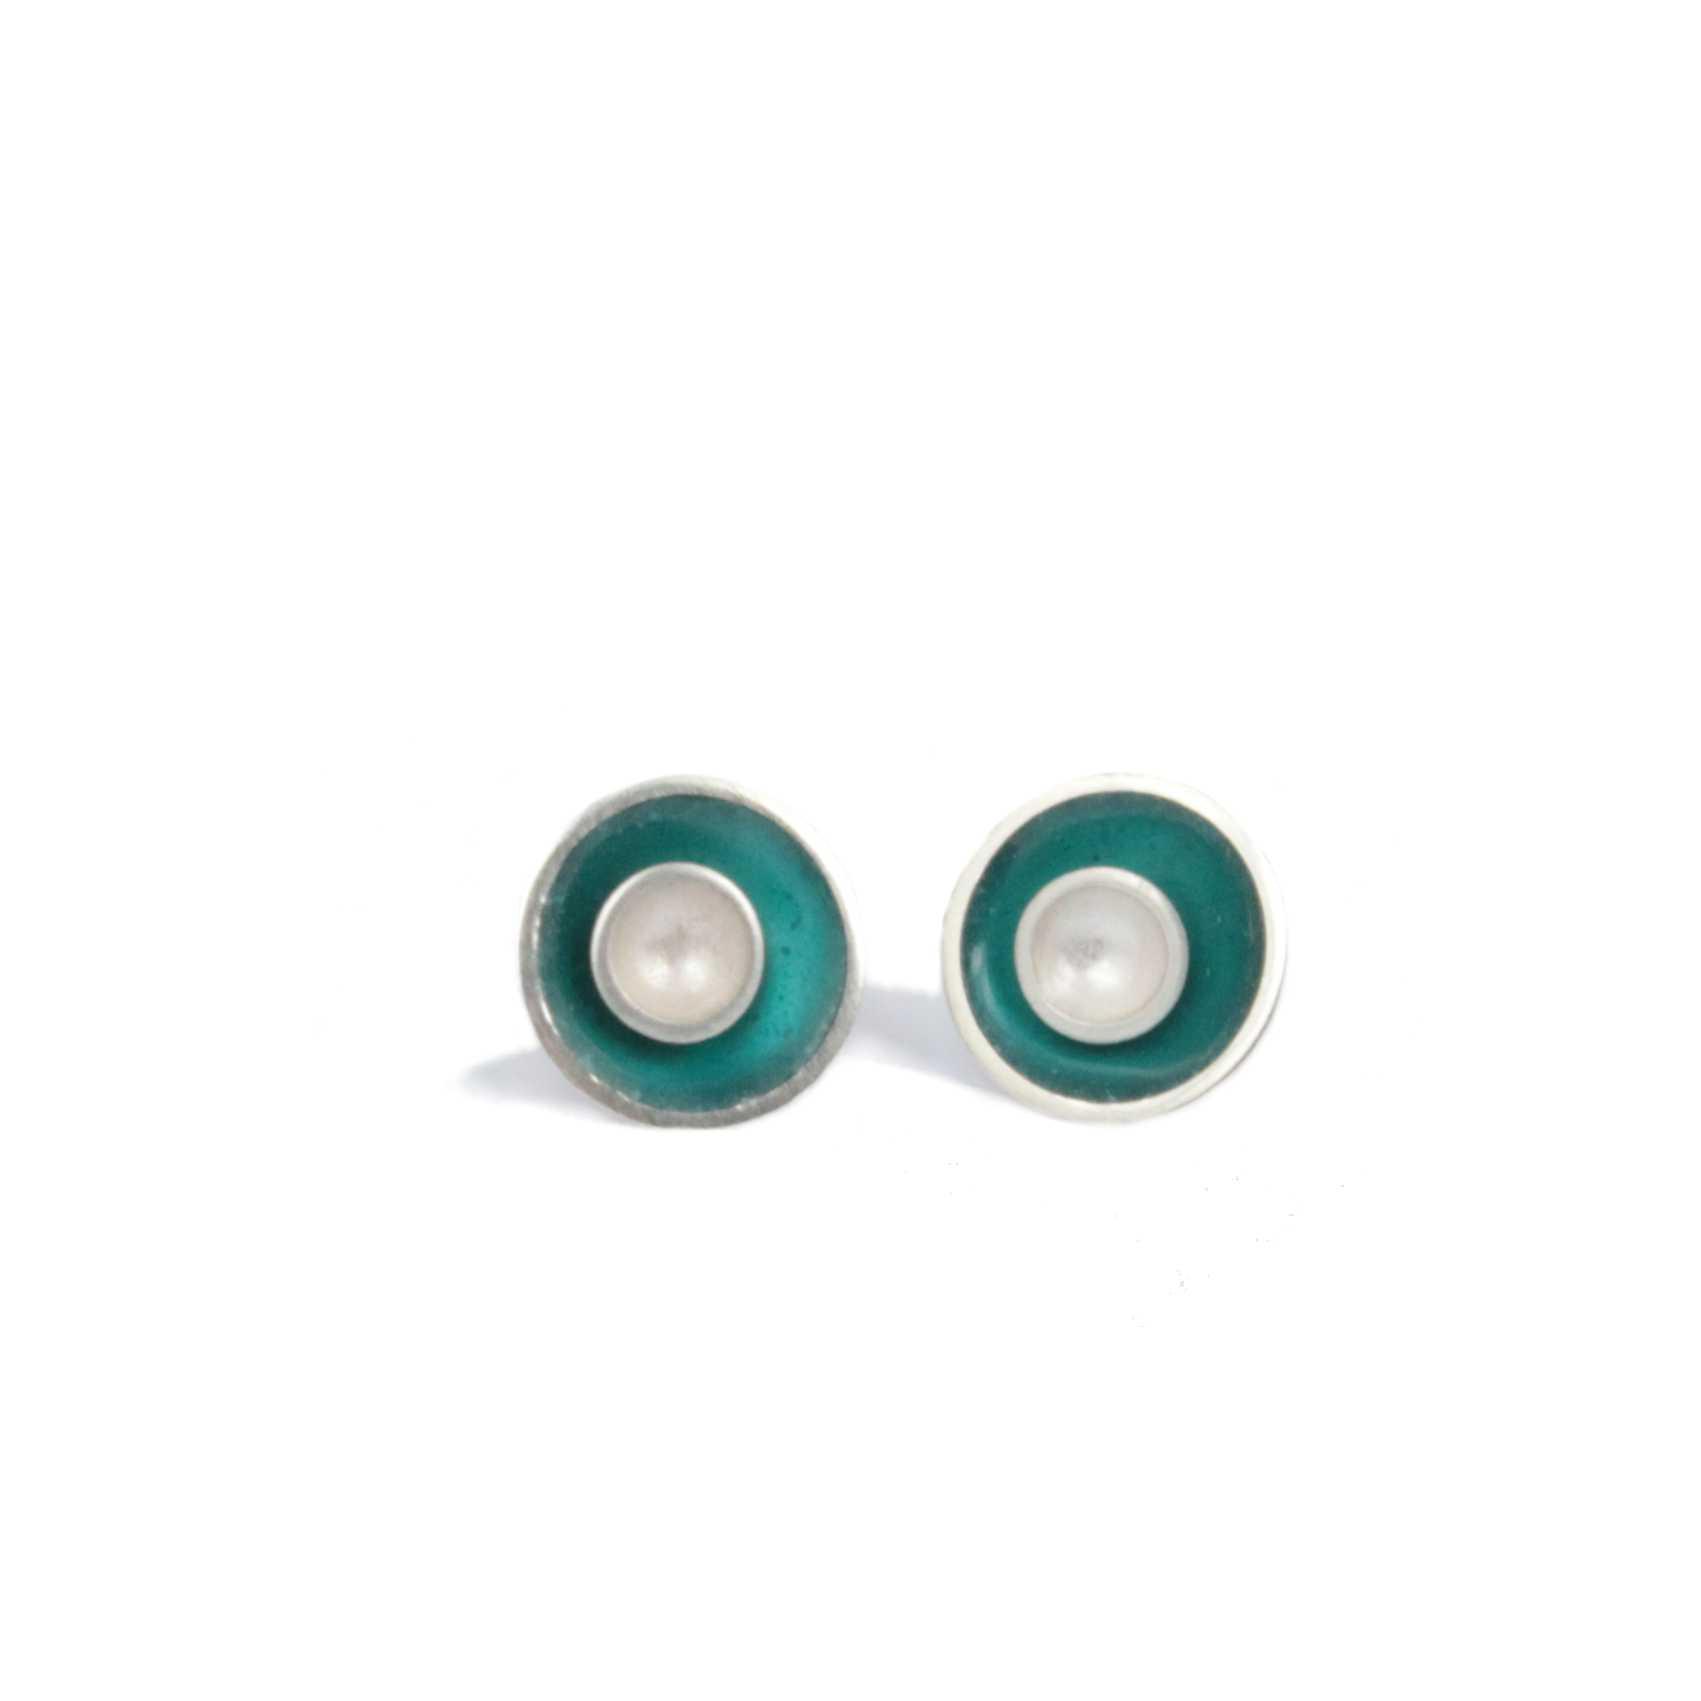 Small Target Silver Stud Earrings